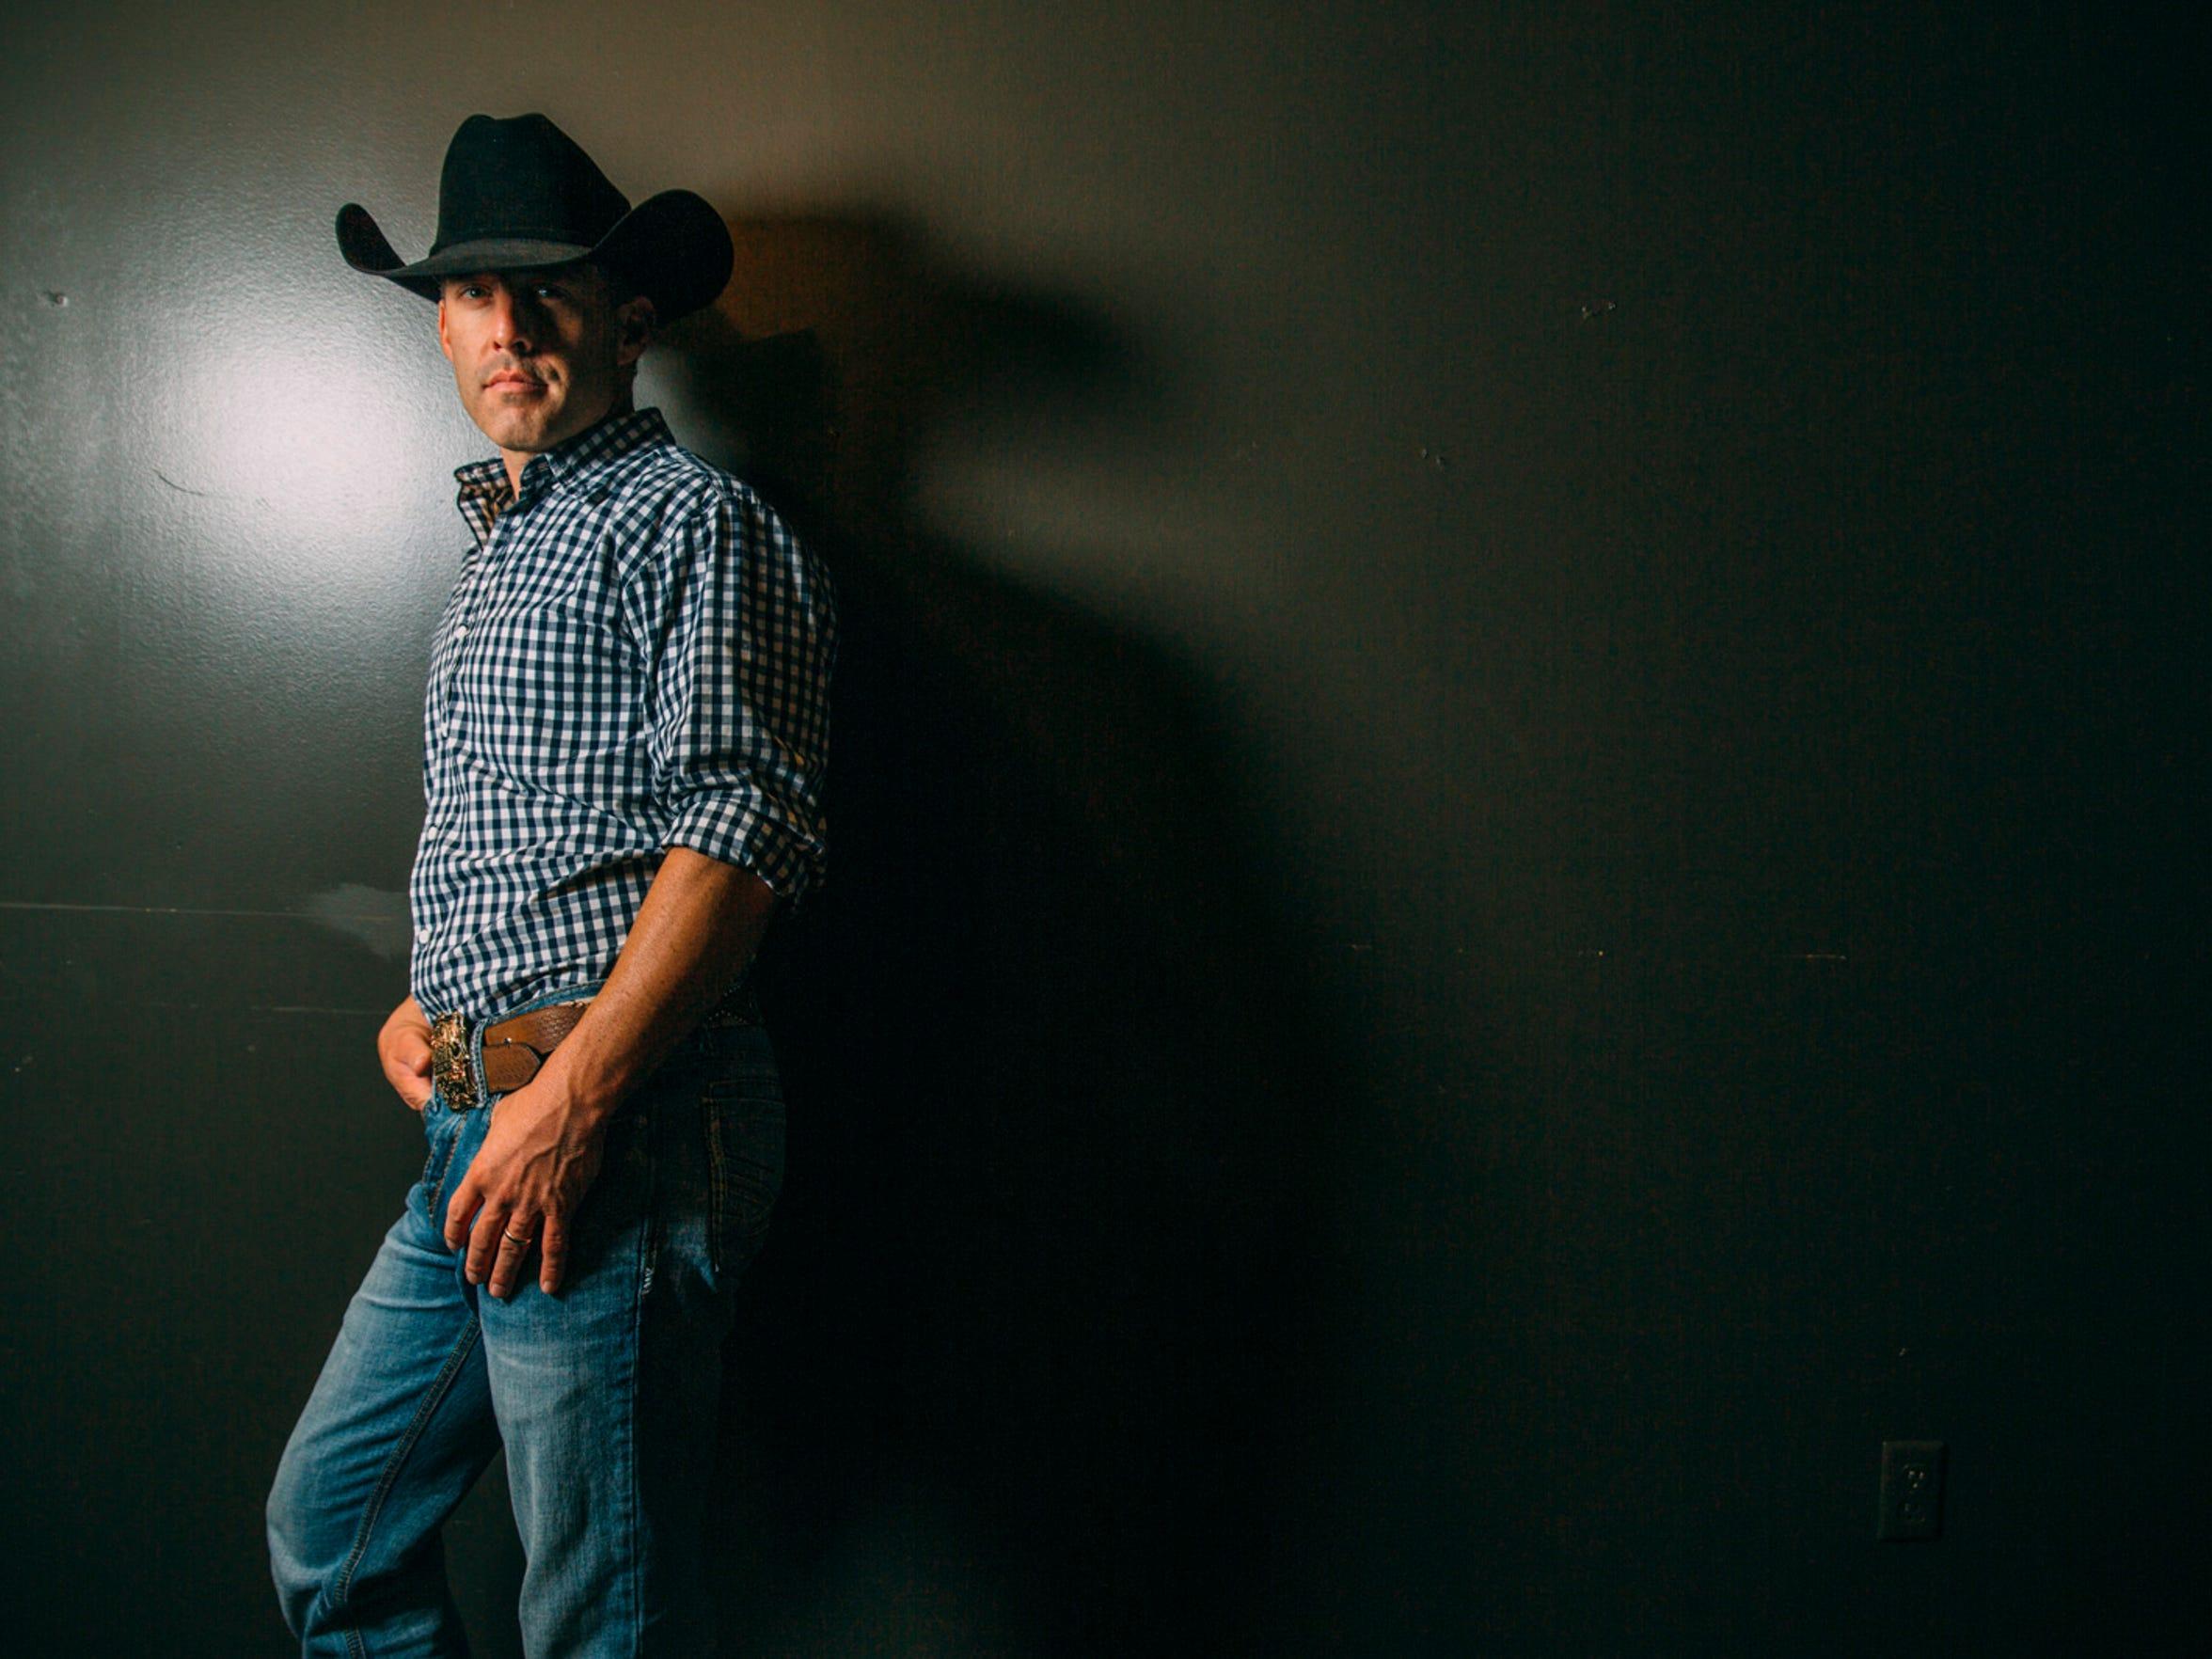 Abilene-based country singer Aaron Watson will keep